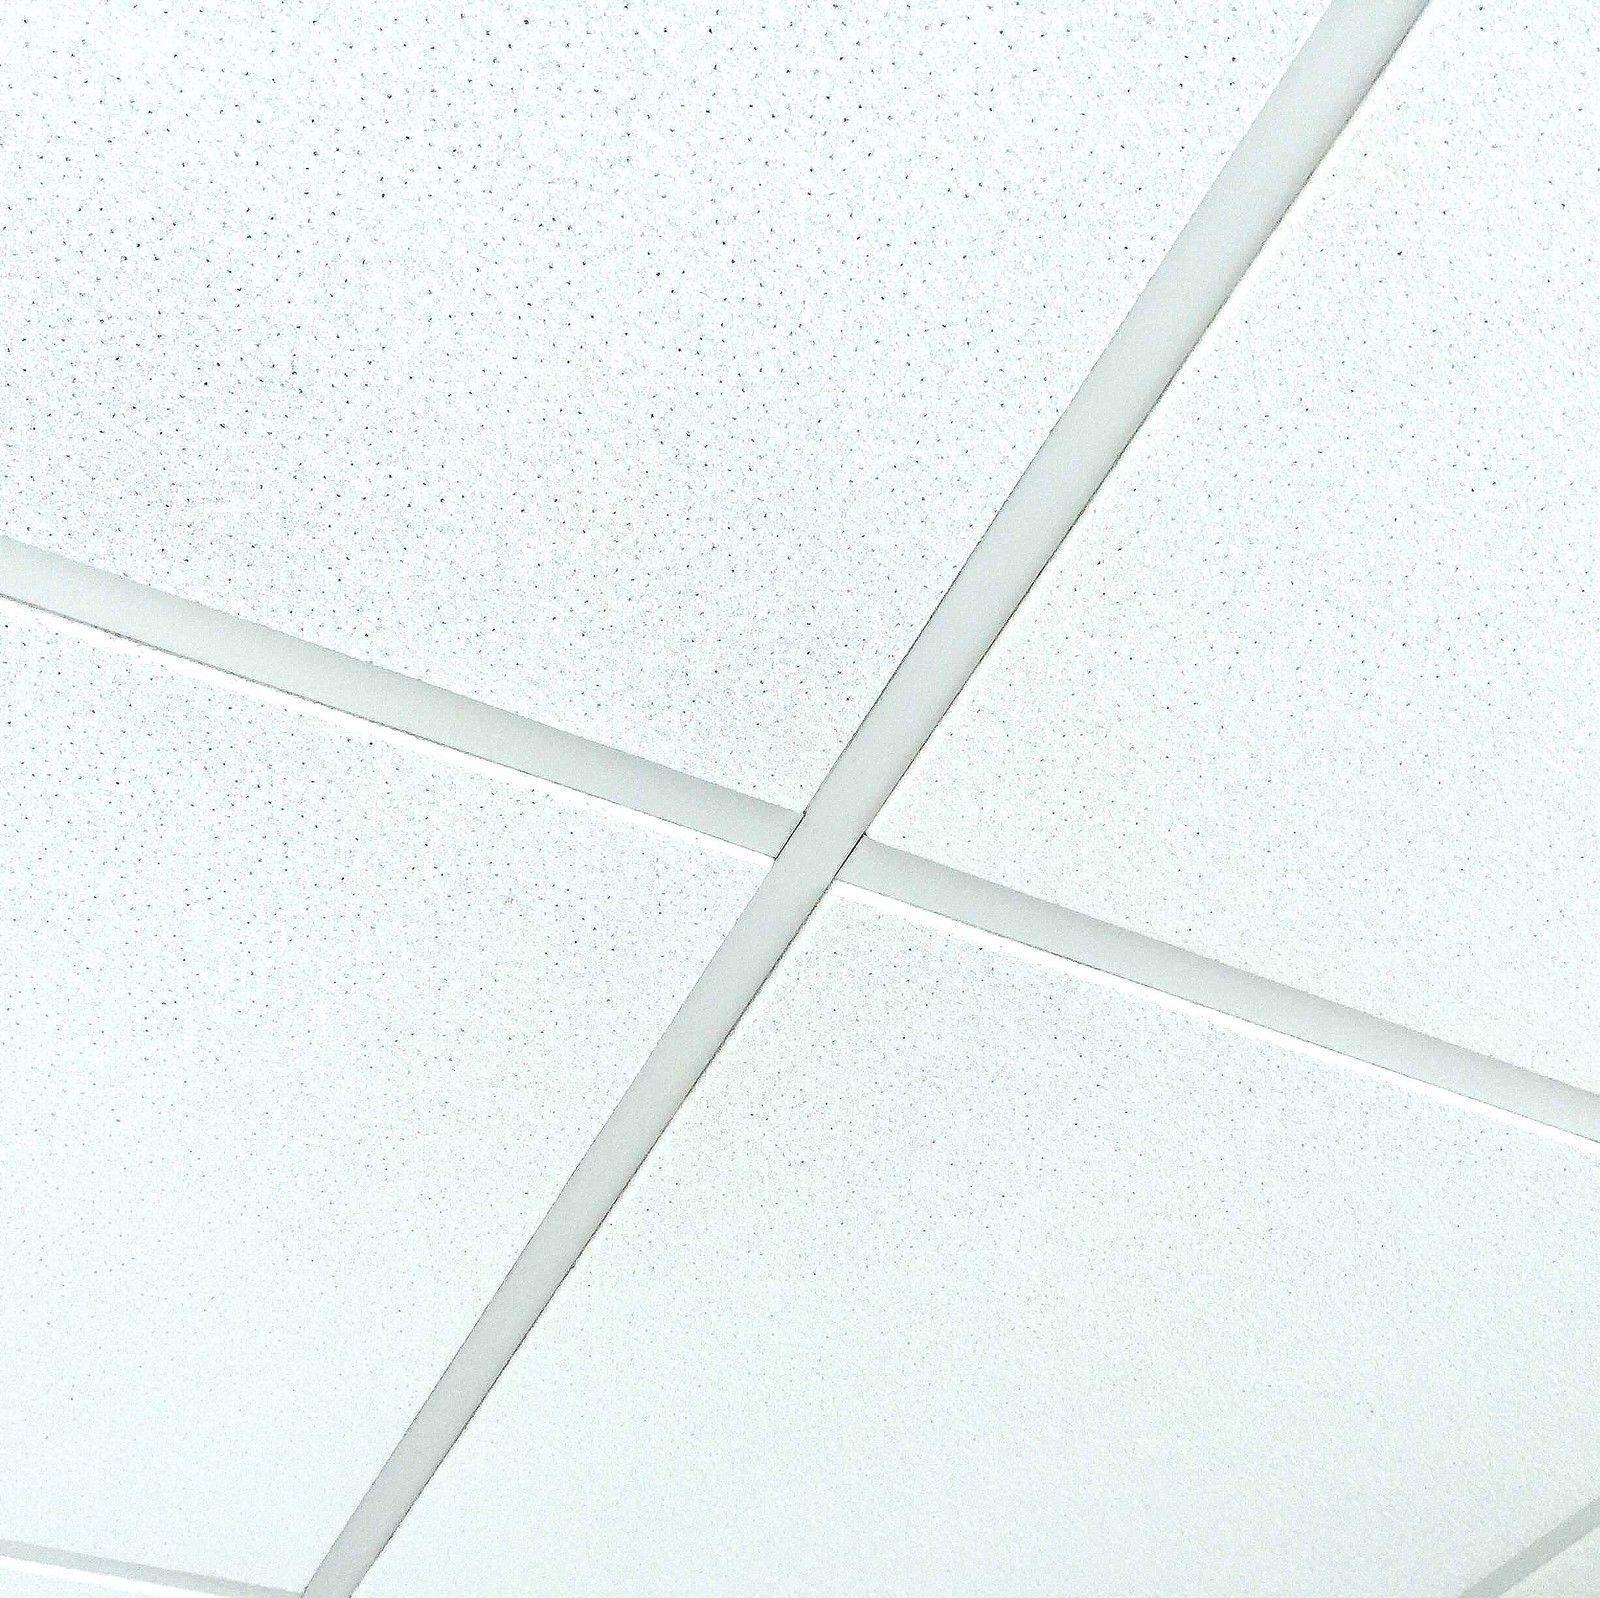 Armstrong Ceiling Tile Cortega 704